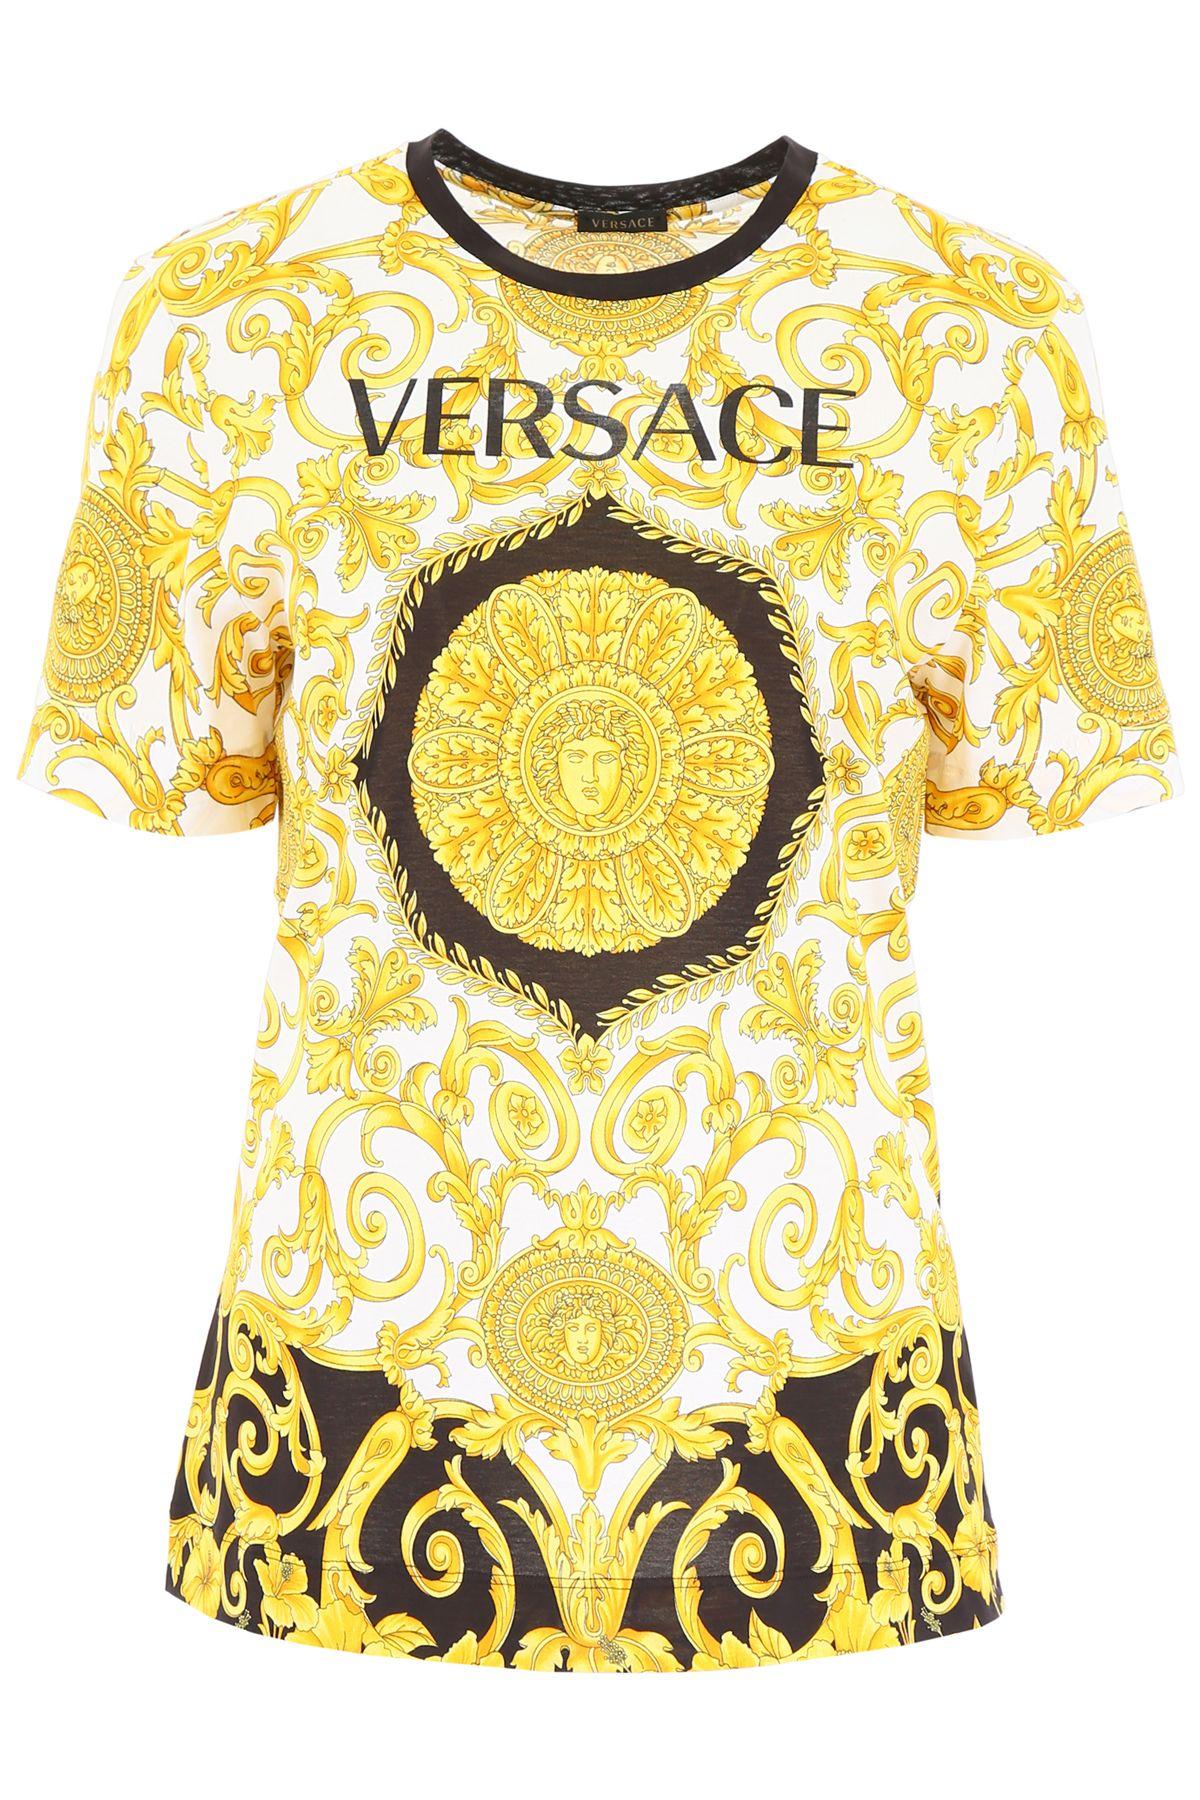 Versace Medusa Barocco T-shirt